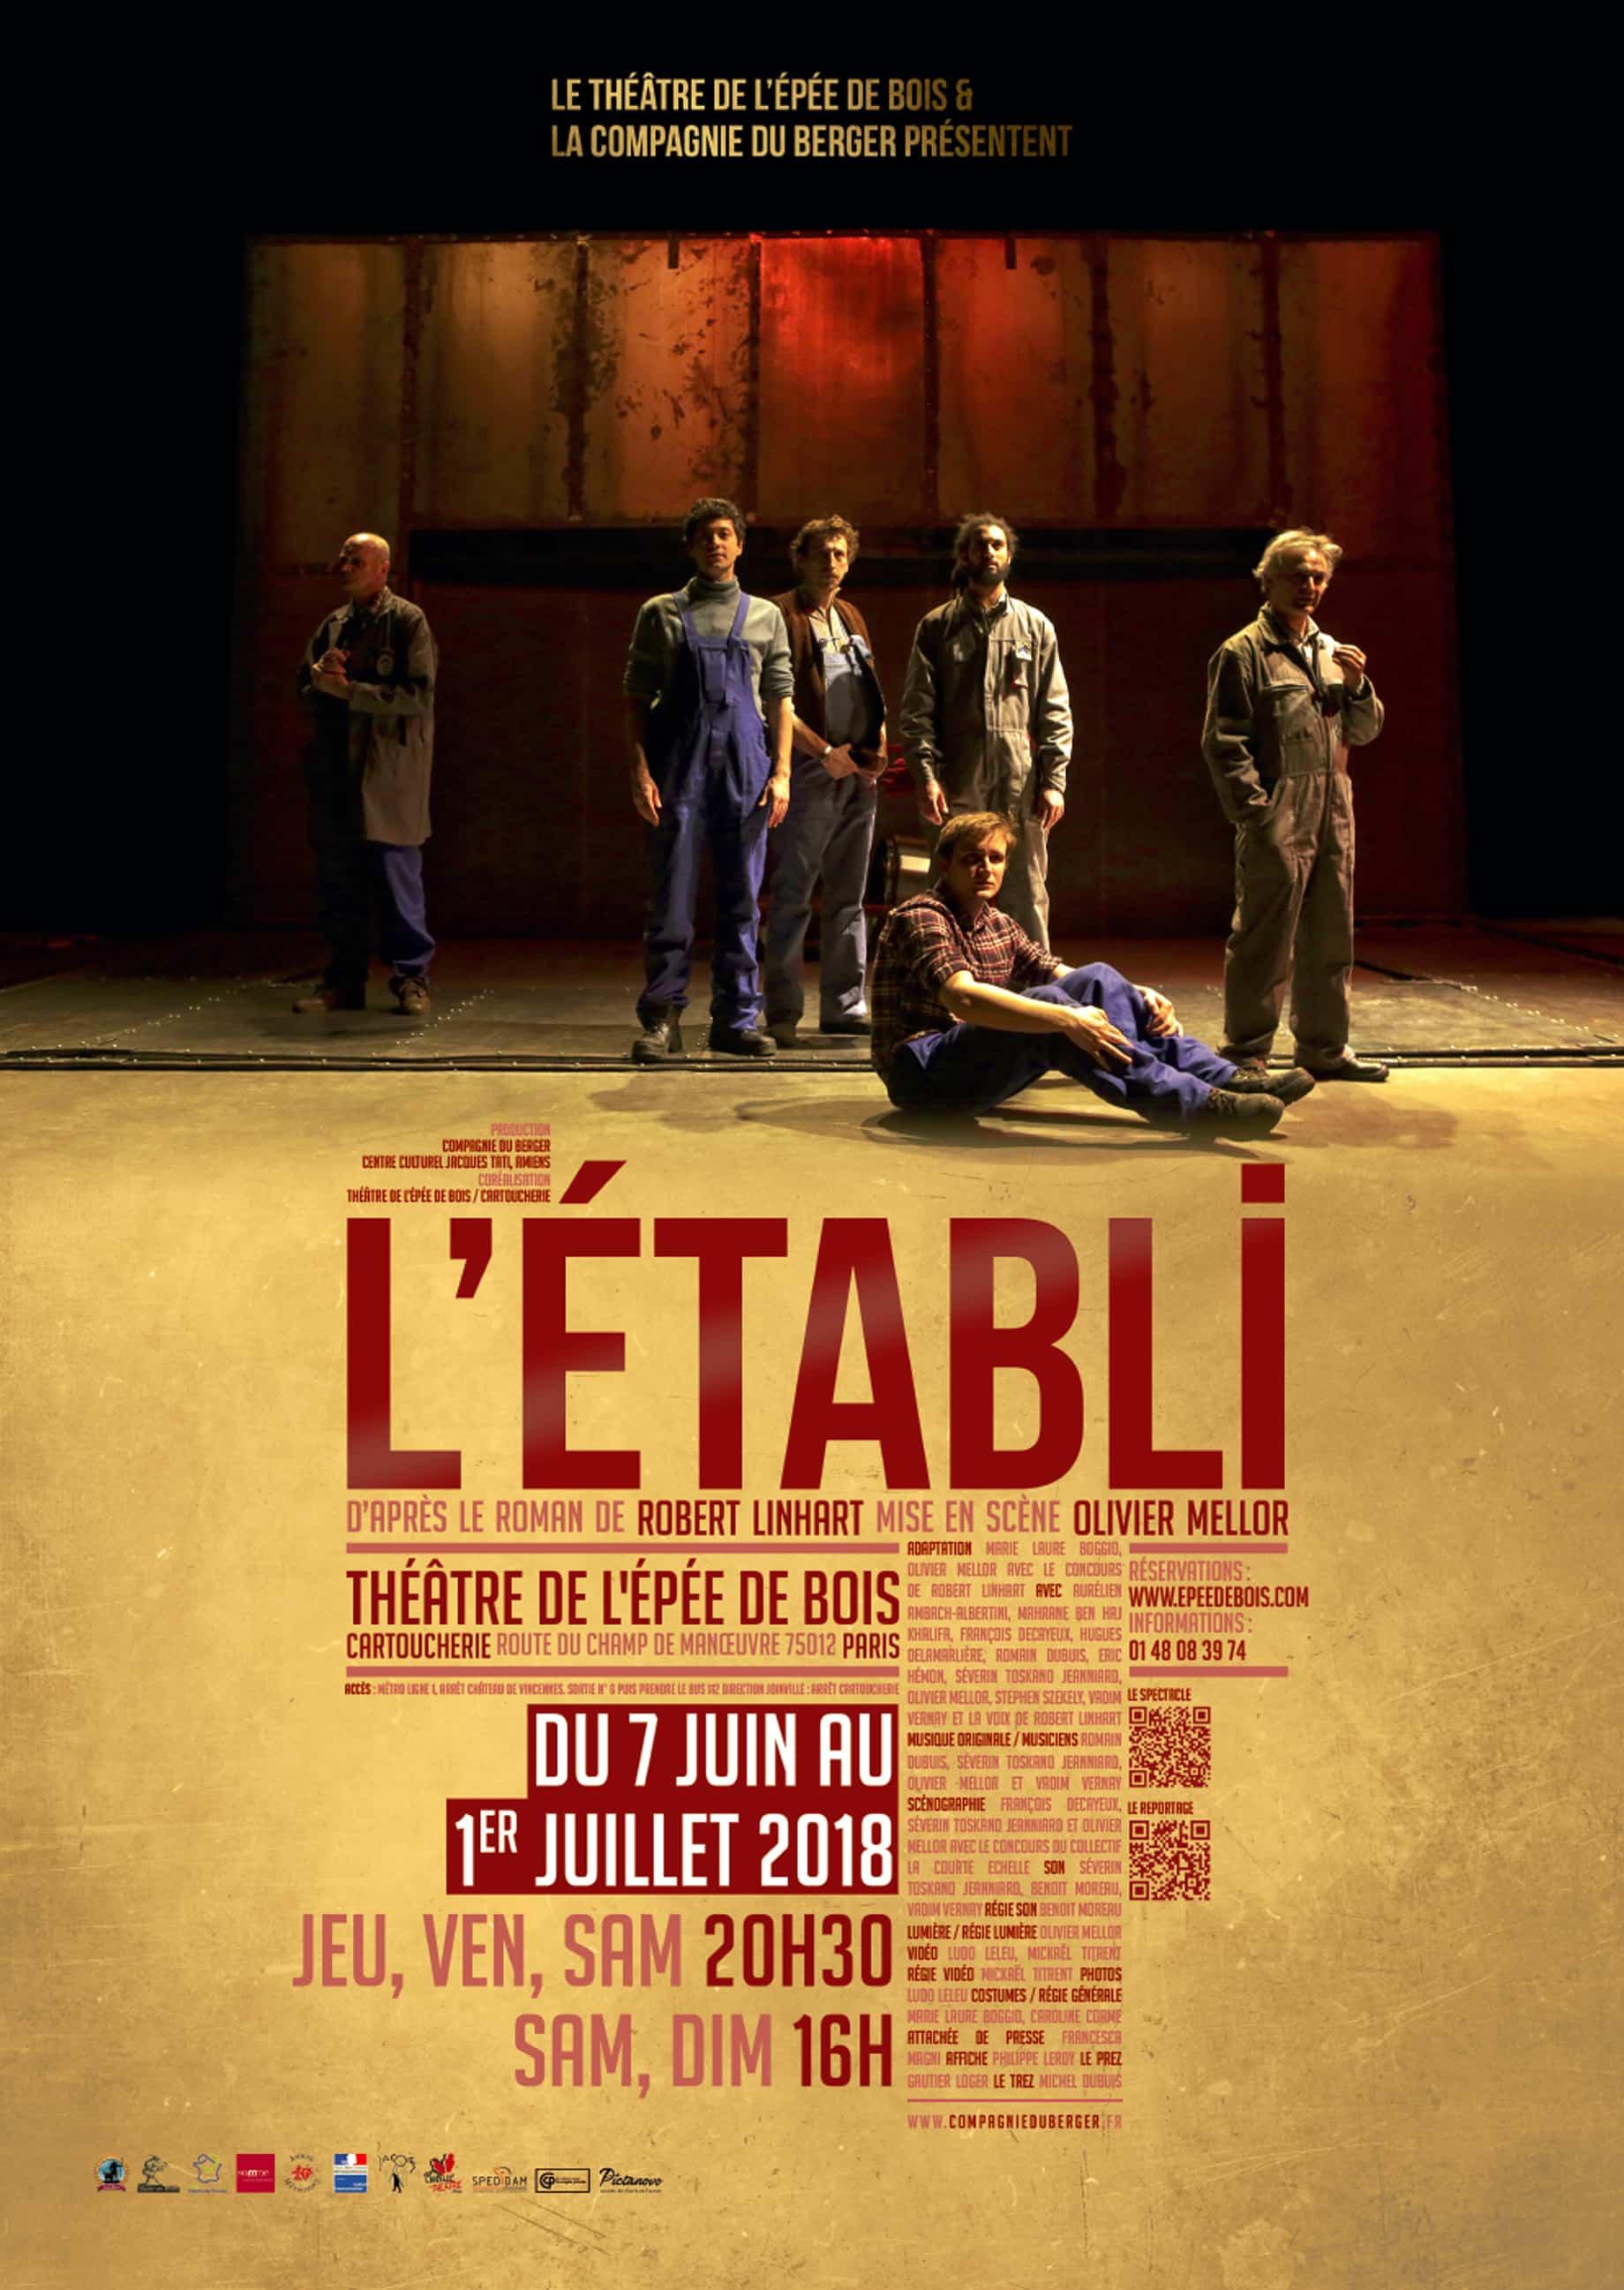 affiche-letabli-paris